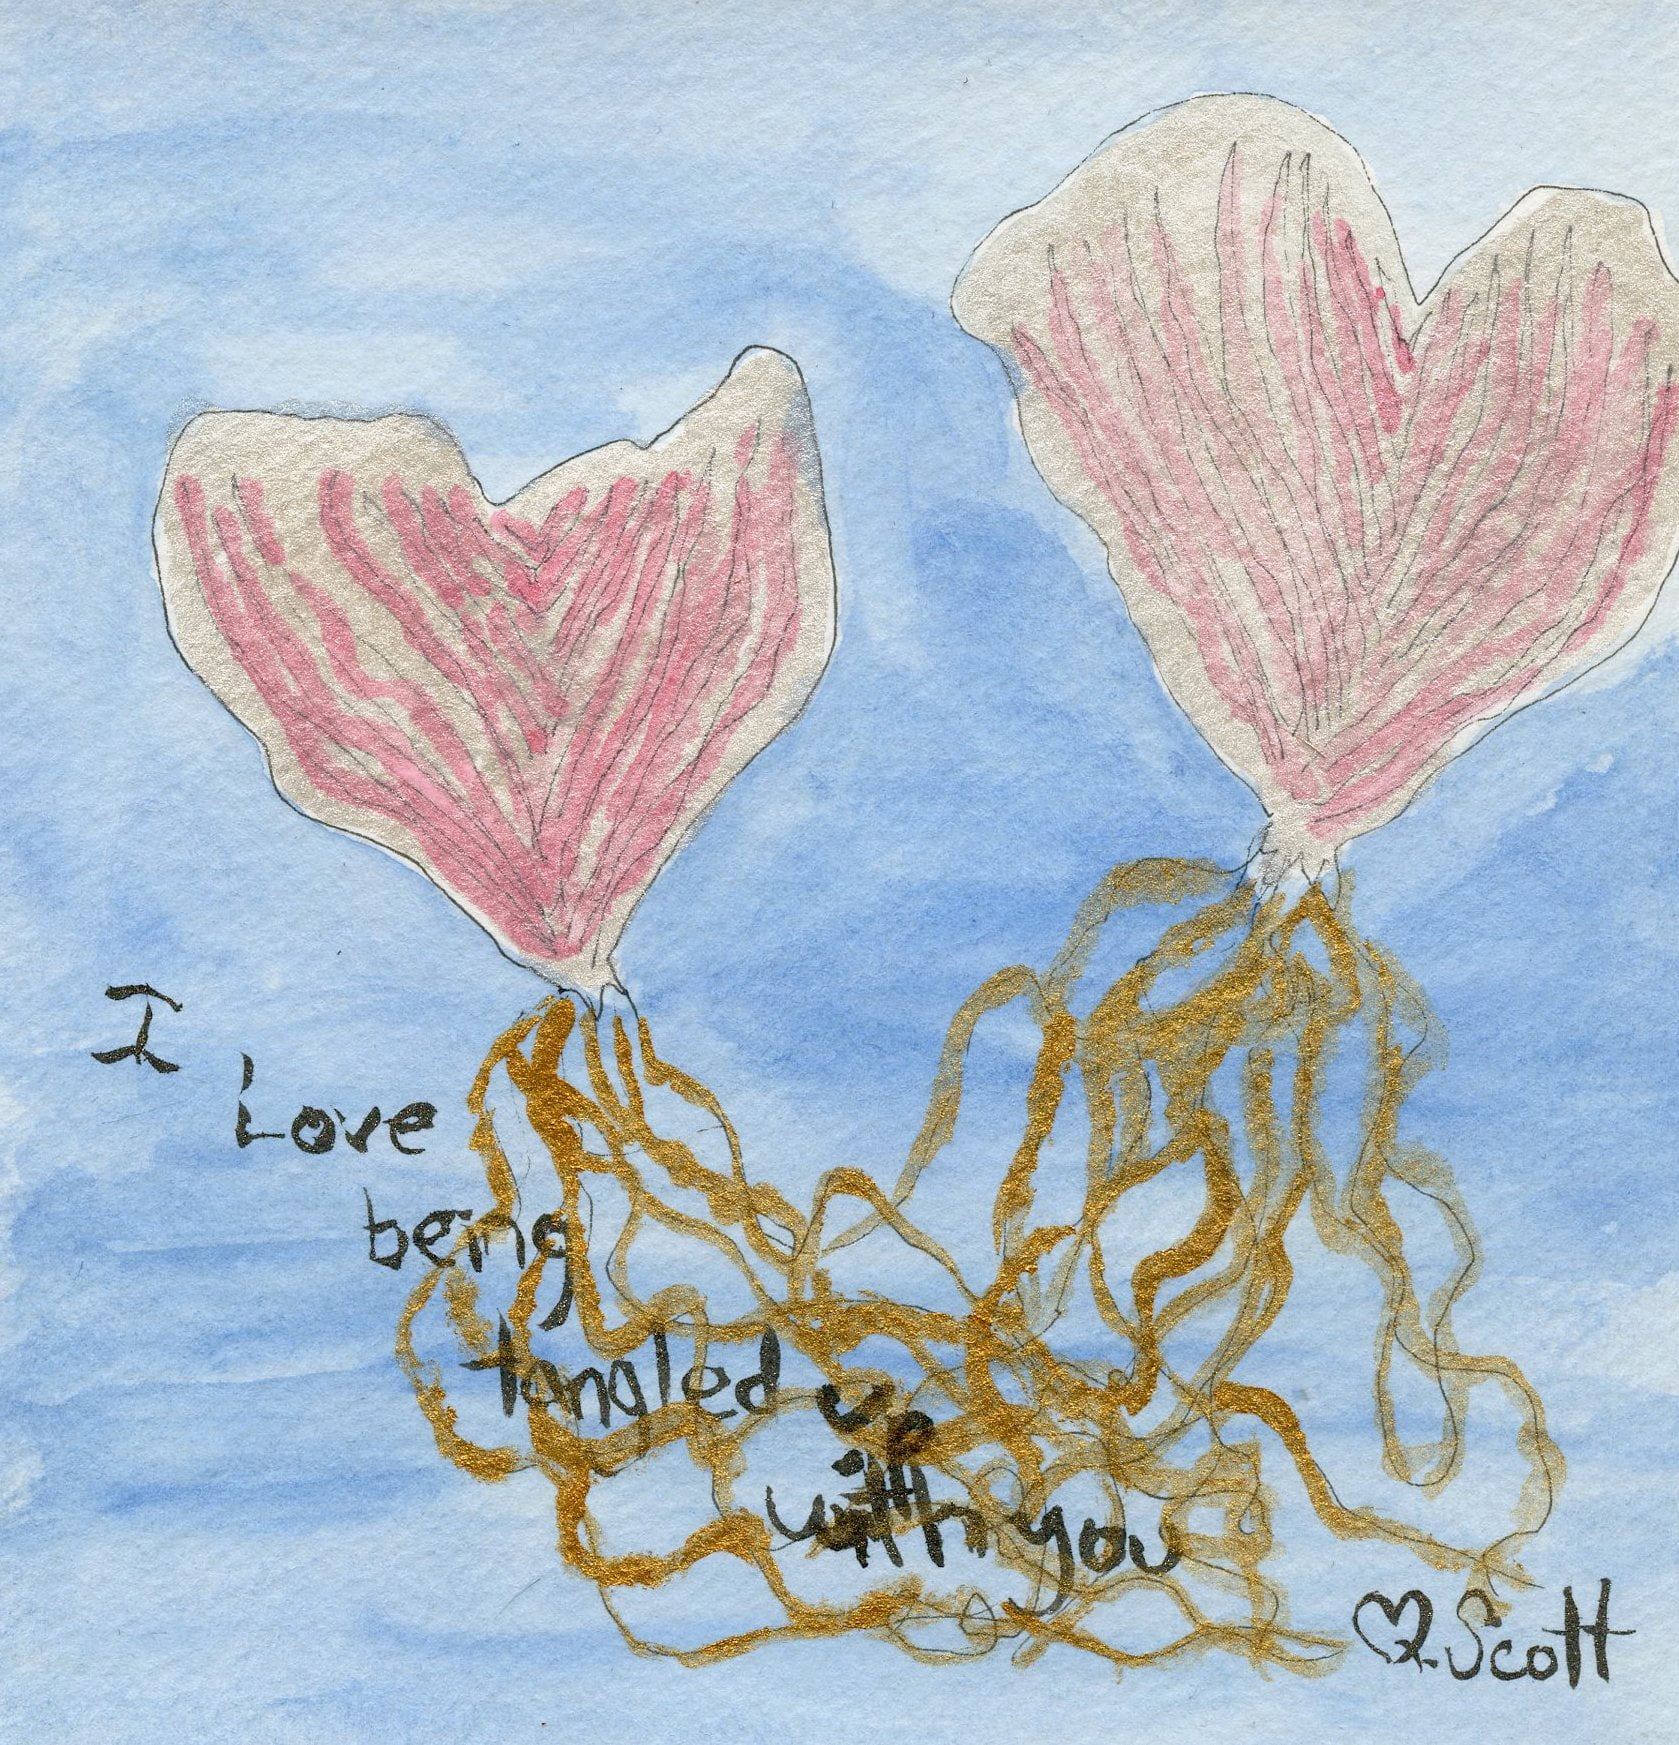 love, tangled